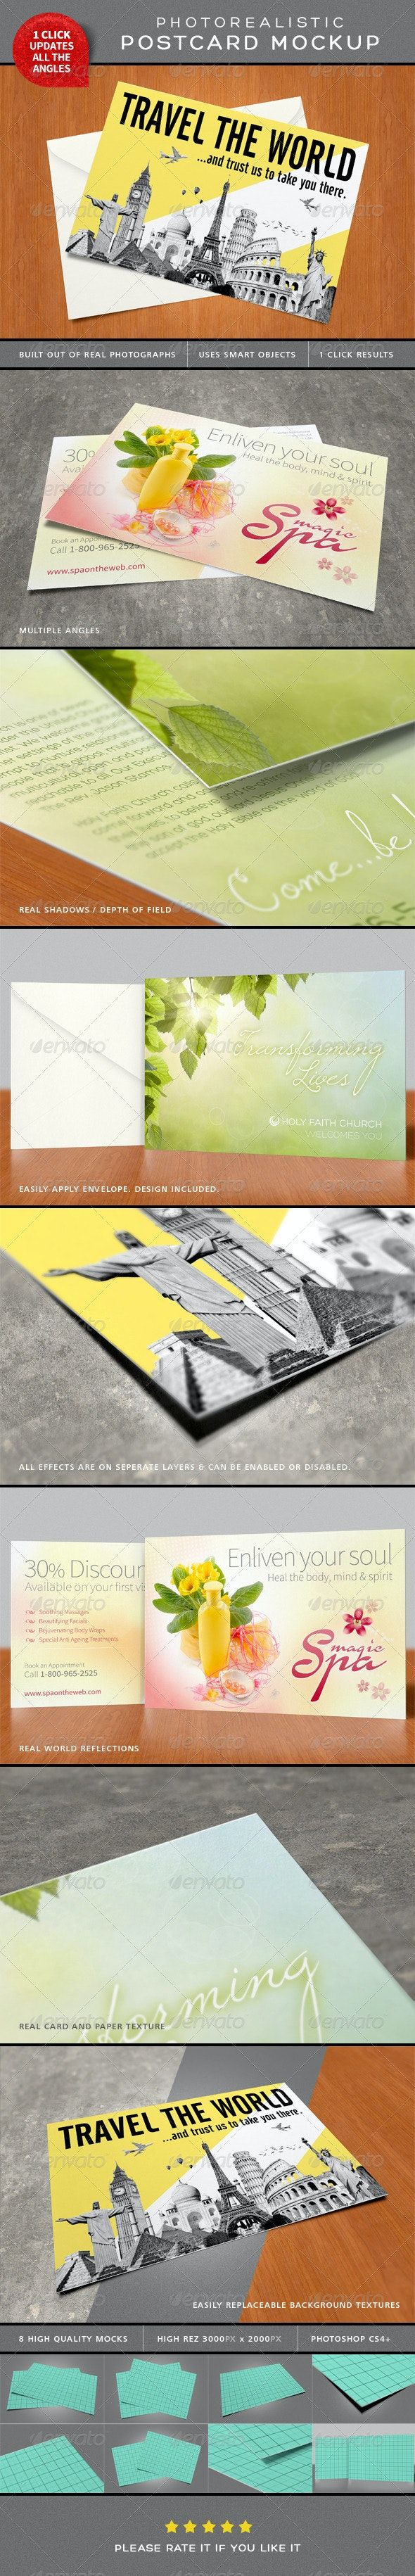 Photorealistic Postcard Mock-Ups - Miscellaneous Print